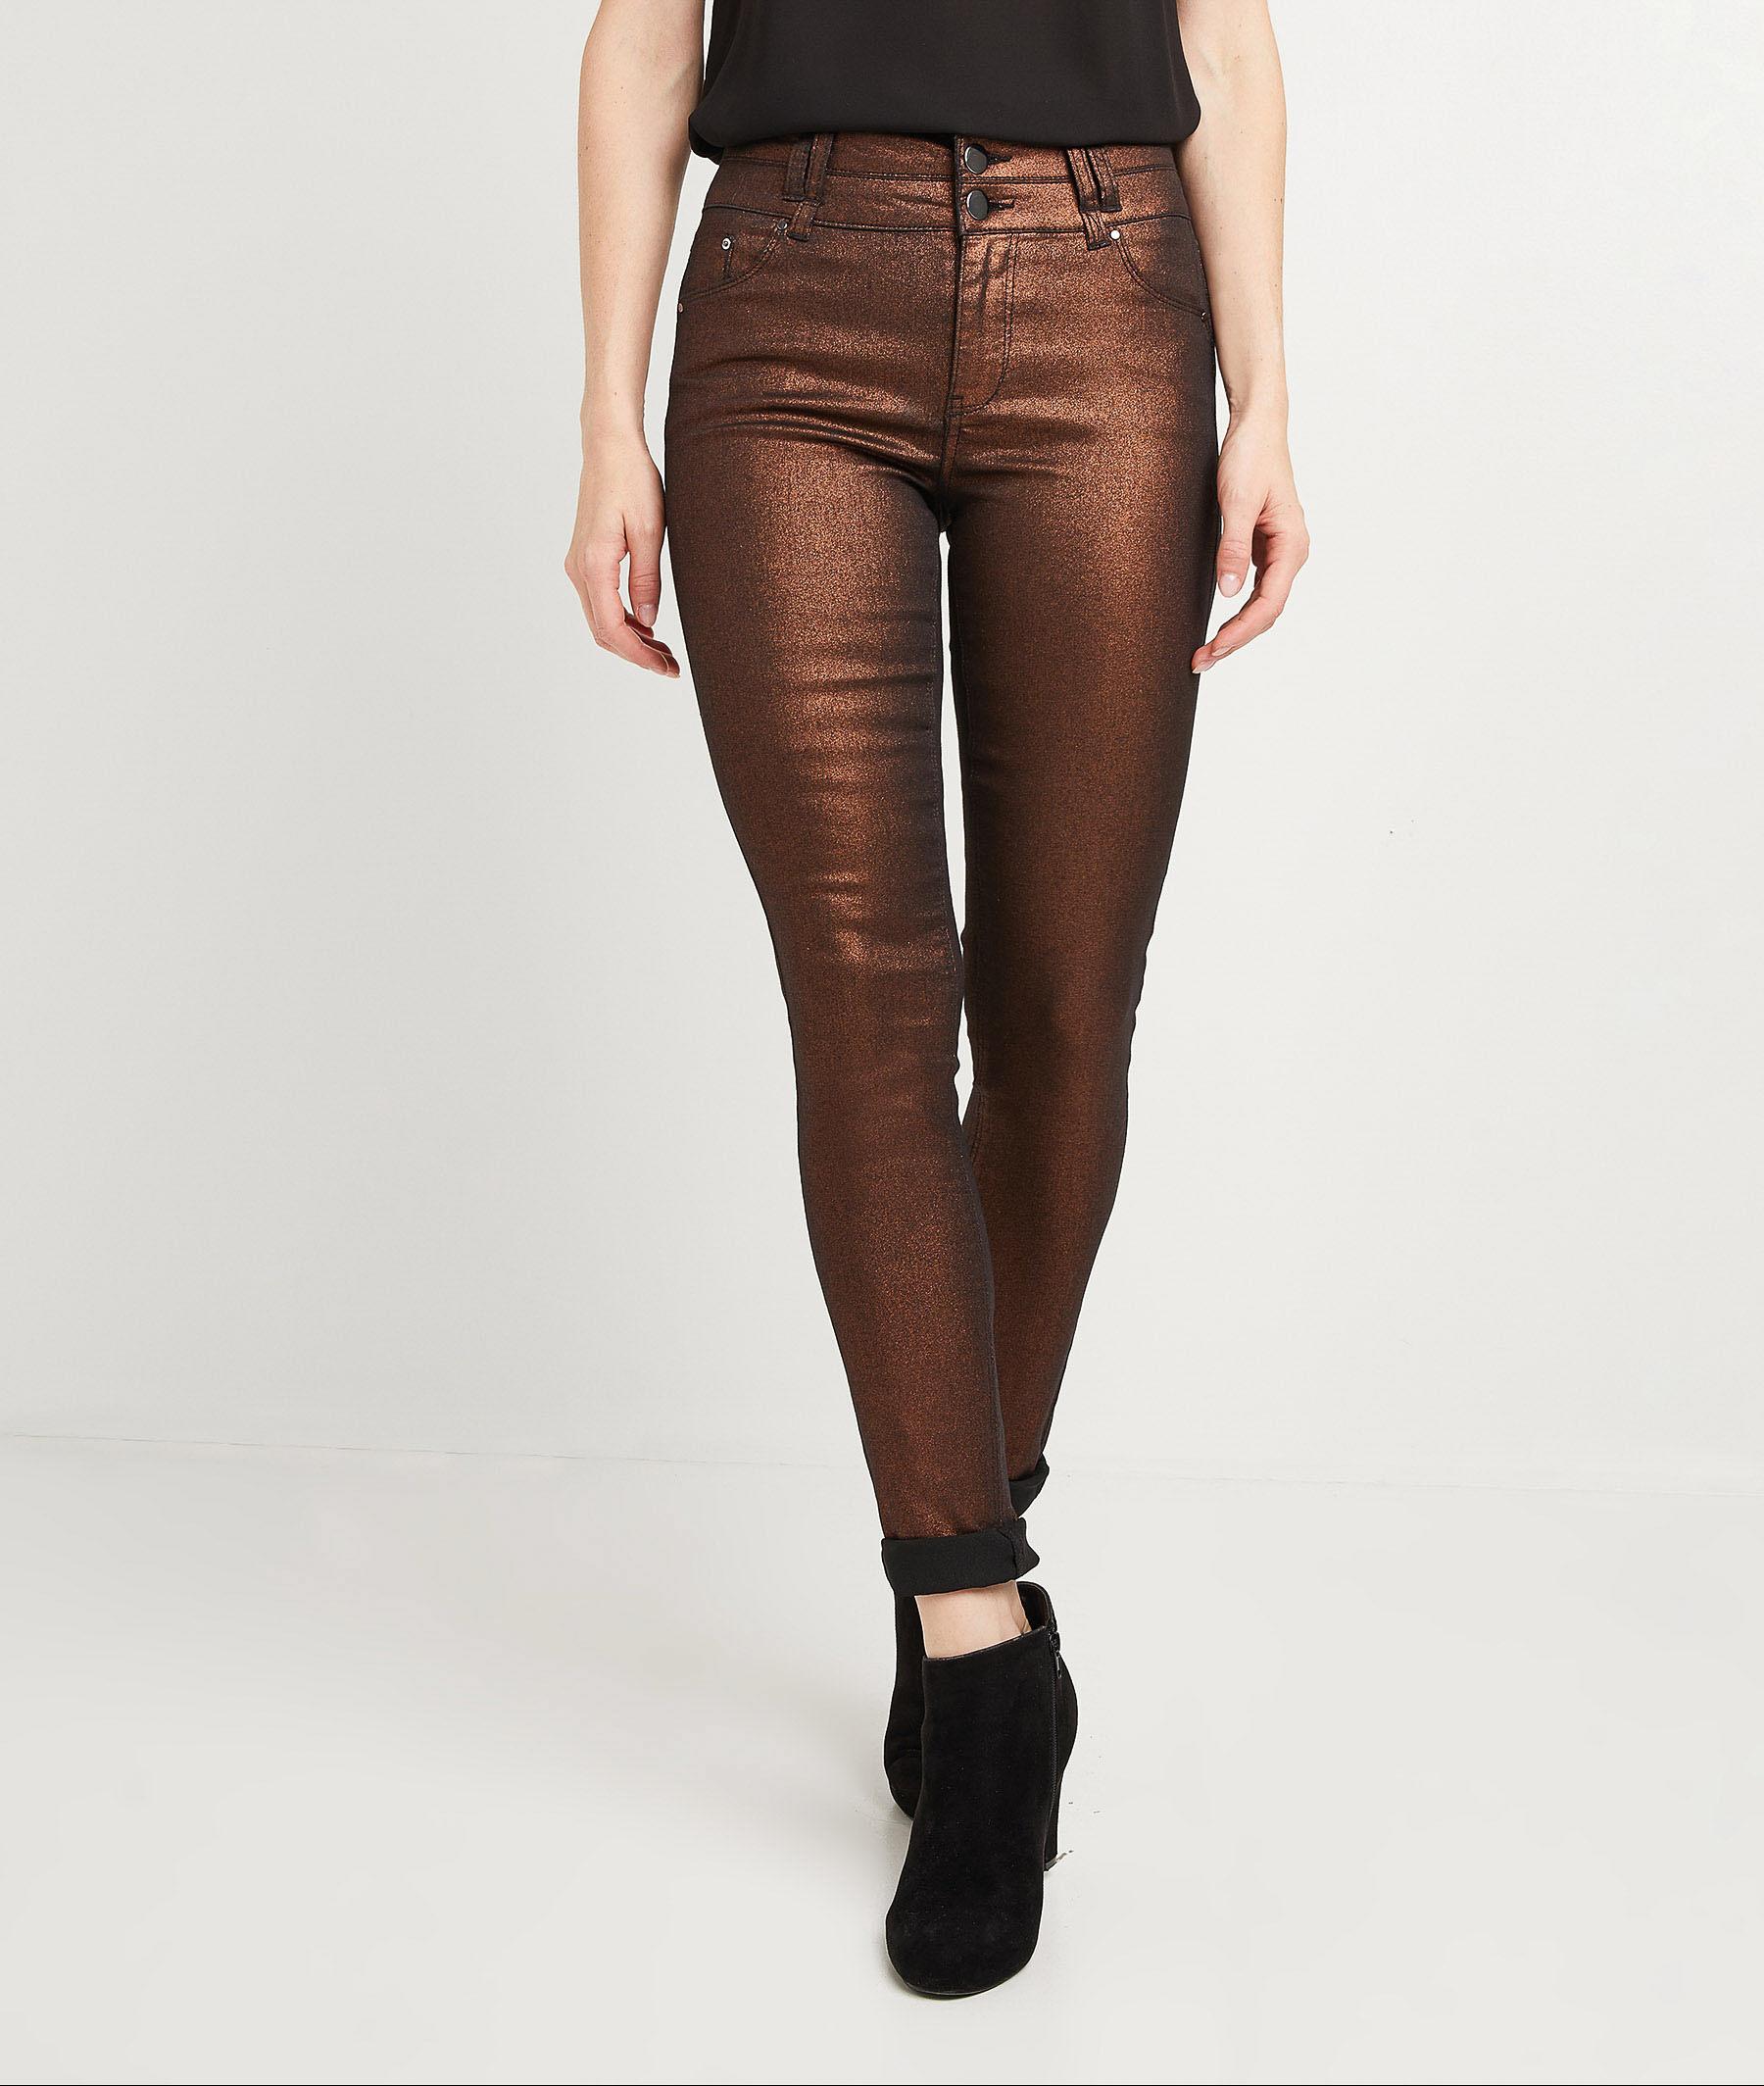 Pantalon slim taille haute enduit femme CARAMEL